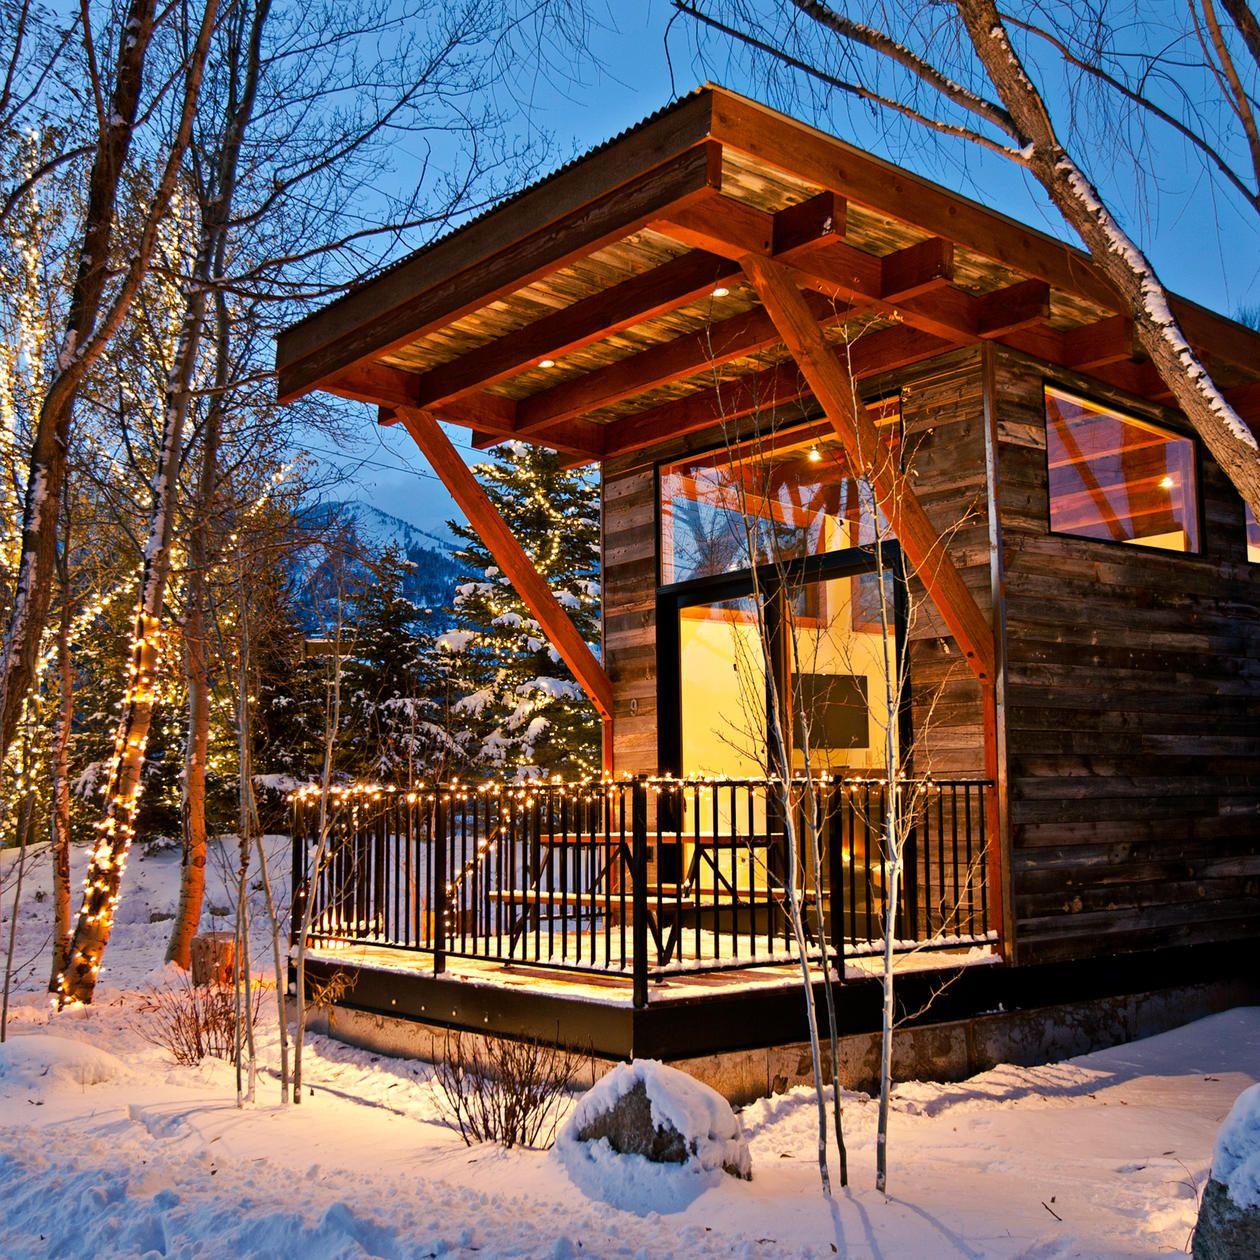 Fireside Resort Updated 2020 Prices Campground Reviews Jackson Hole Wy Wilson Tripadvisor Wyoming Vacation Jackson Hole Wyoming Travel